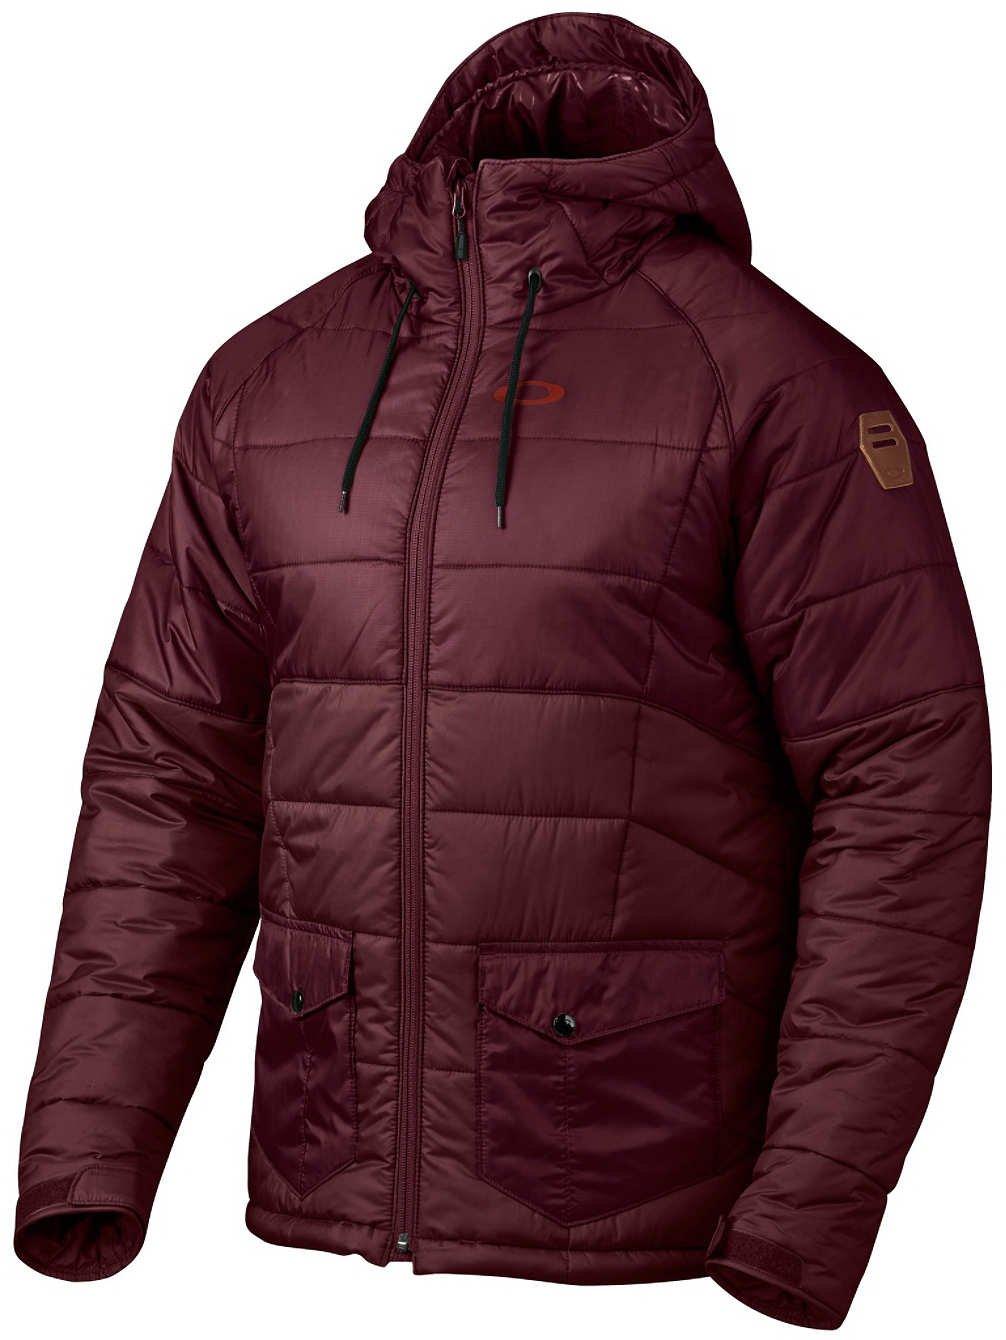 Oakley Herren Winterbekleidung Hull Thinsulate Jacket